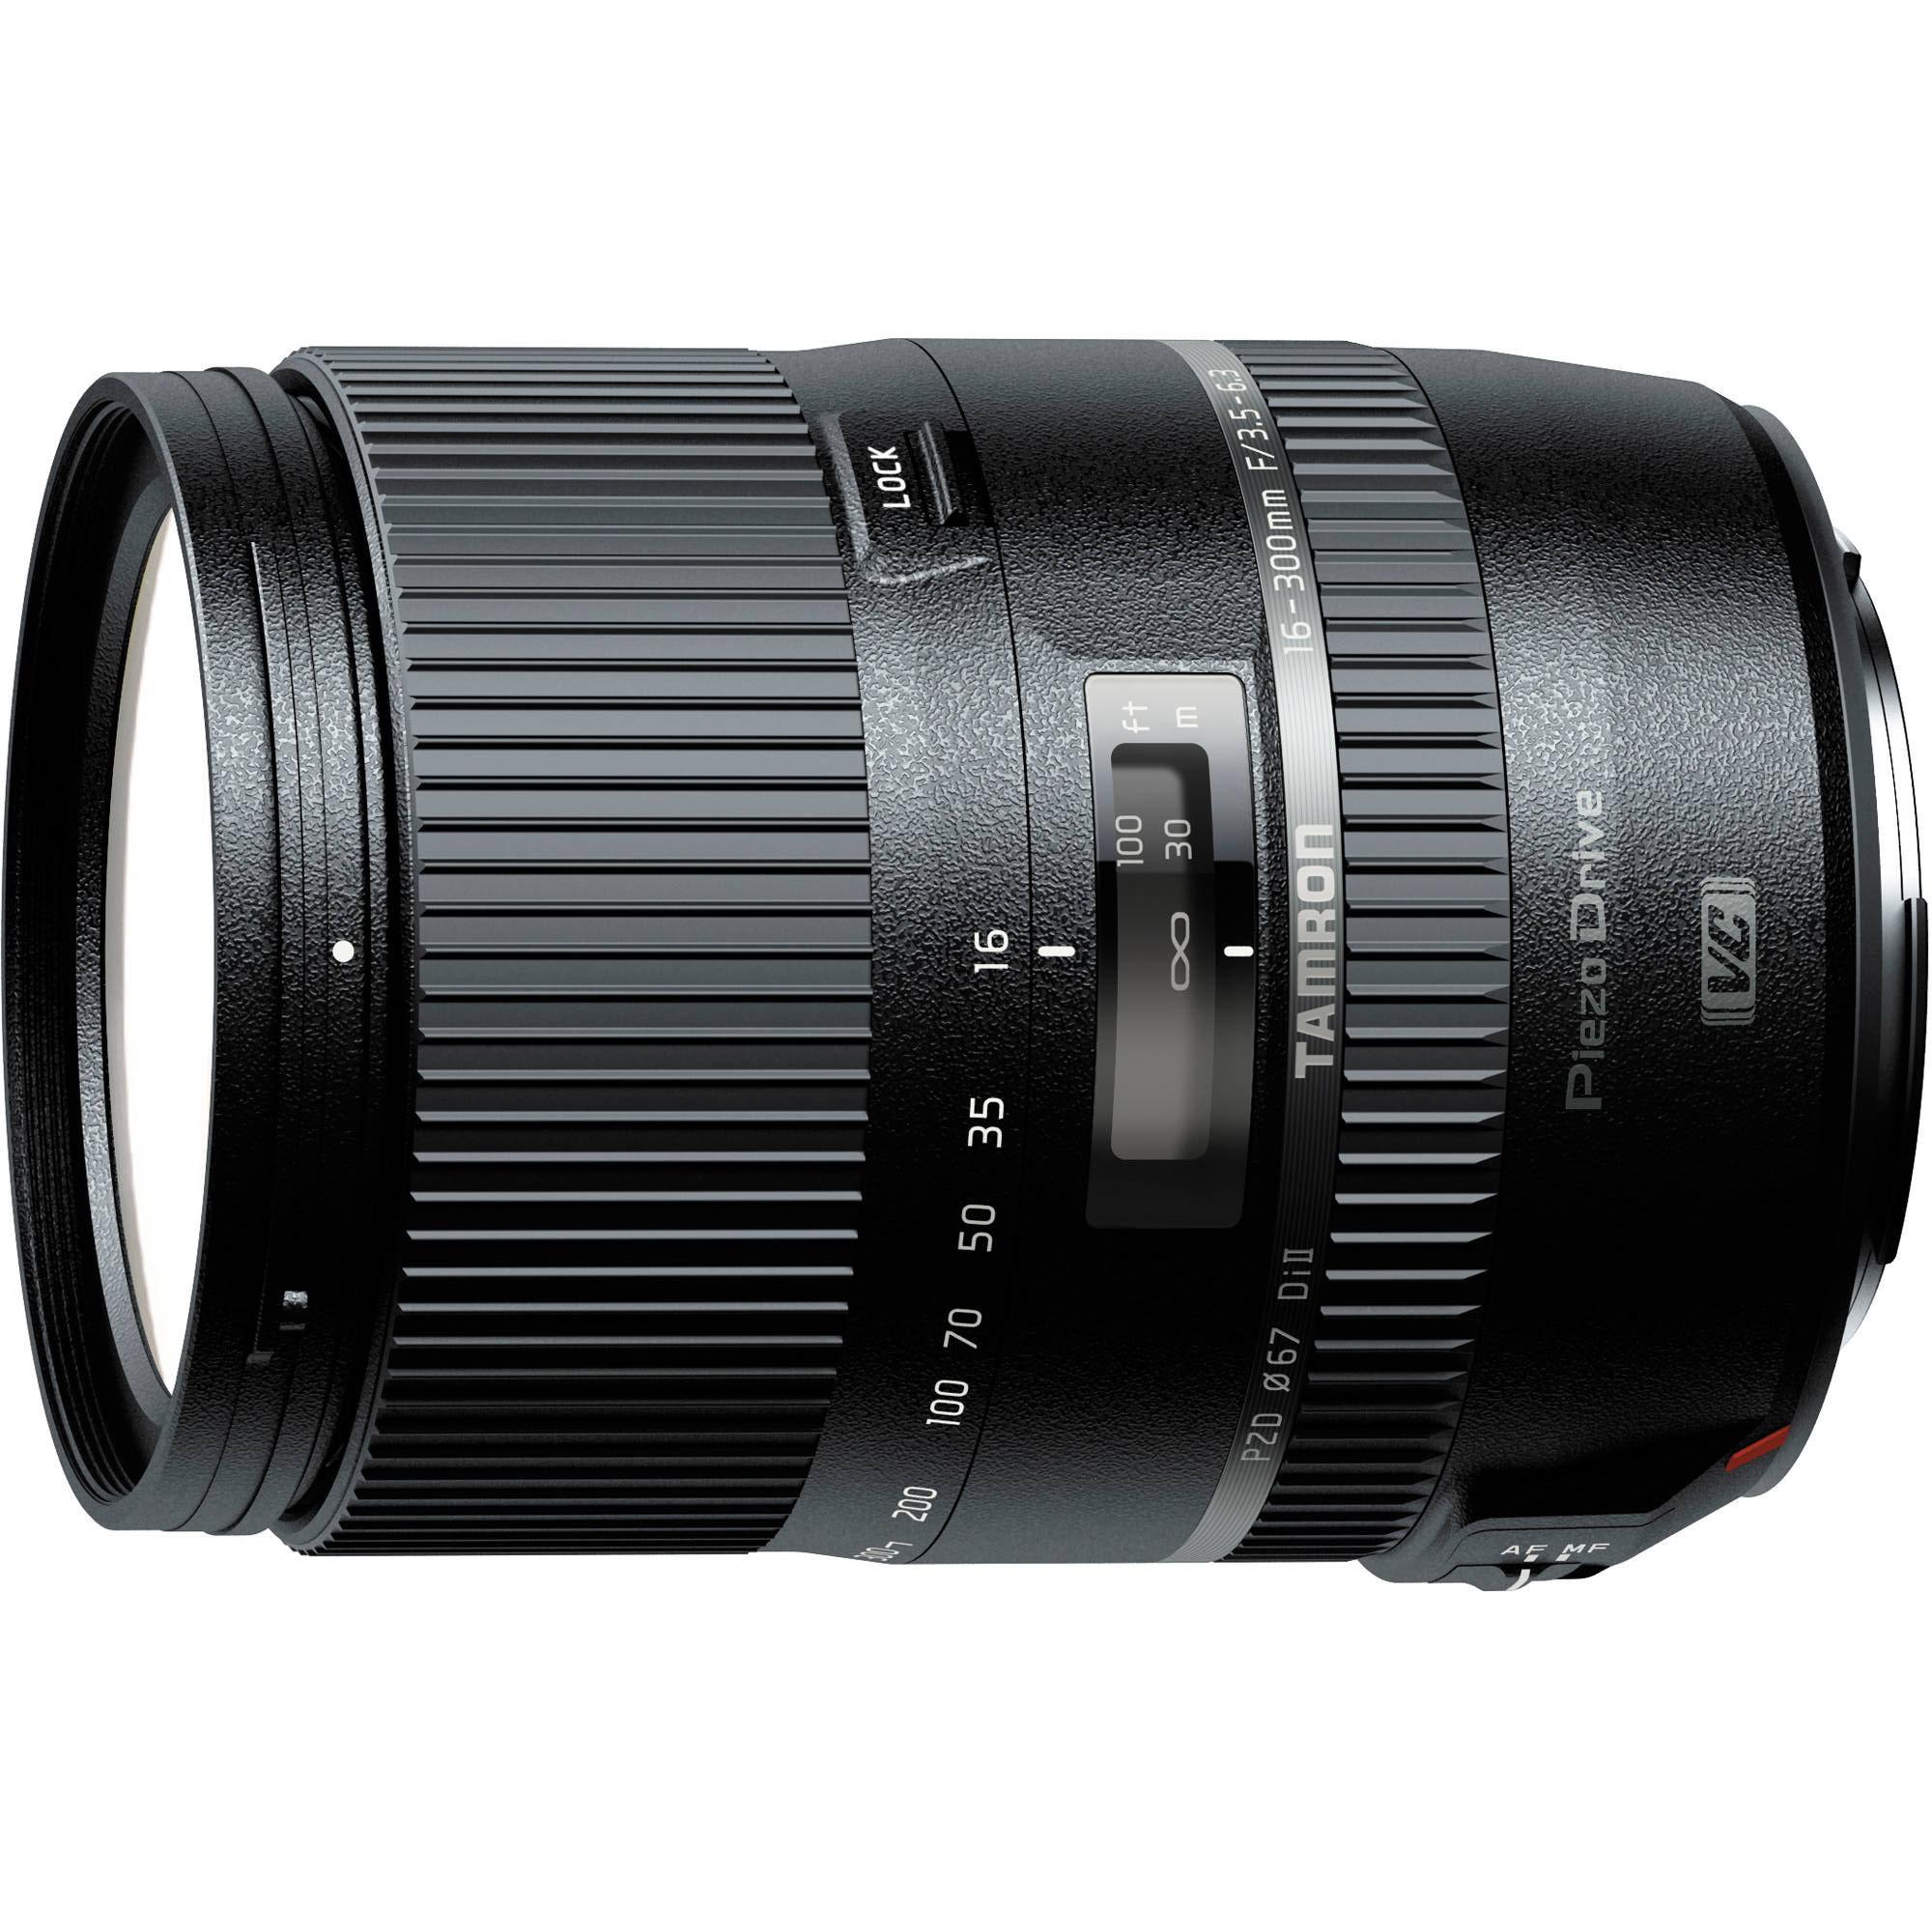 Announced 16-300mm f/3.5-6.3 Di II PZD Macro Lens for APS-C Cameras